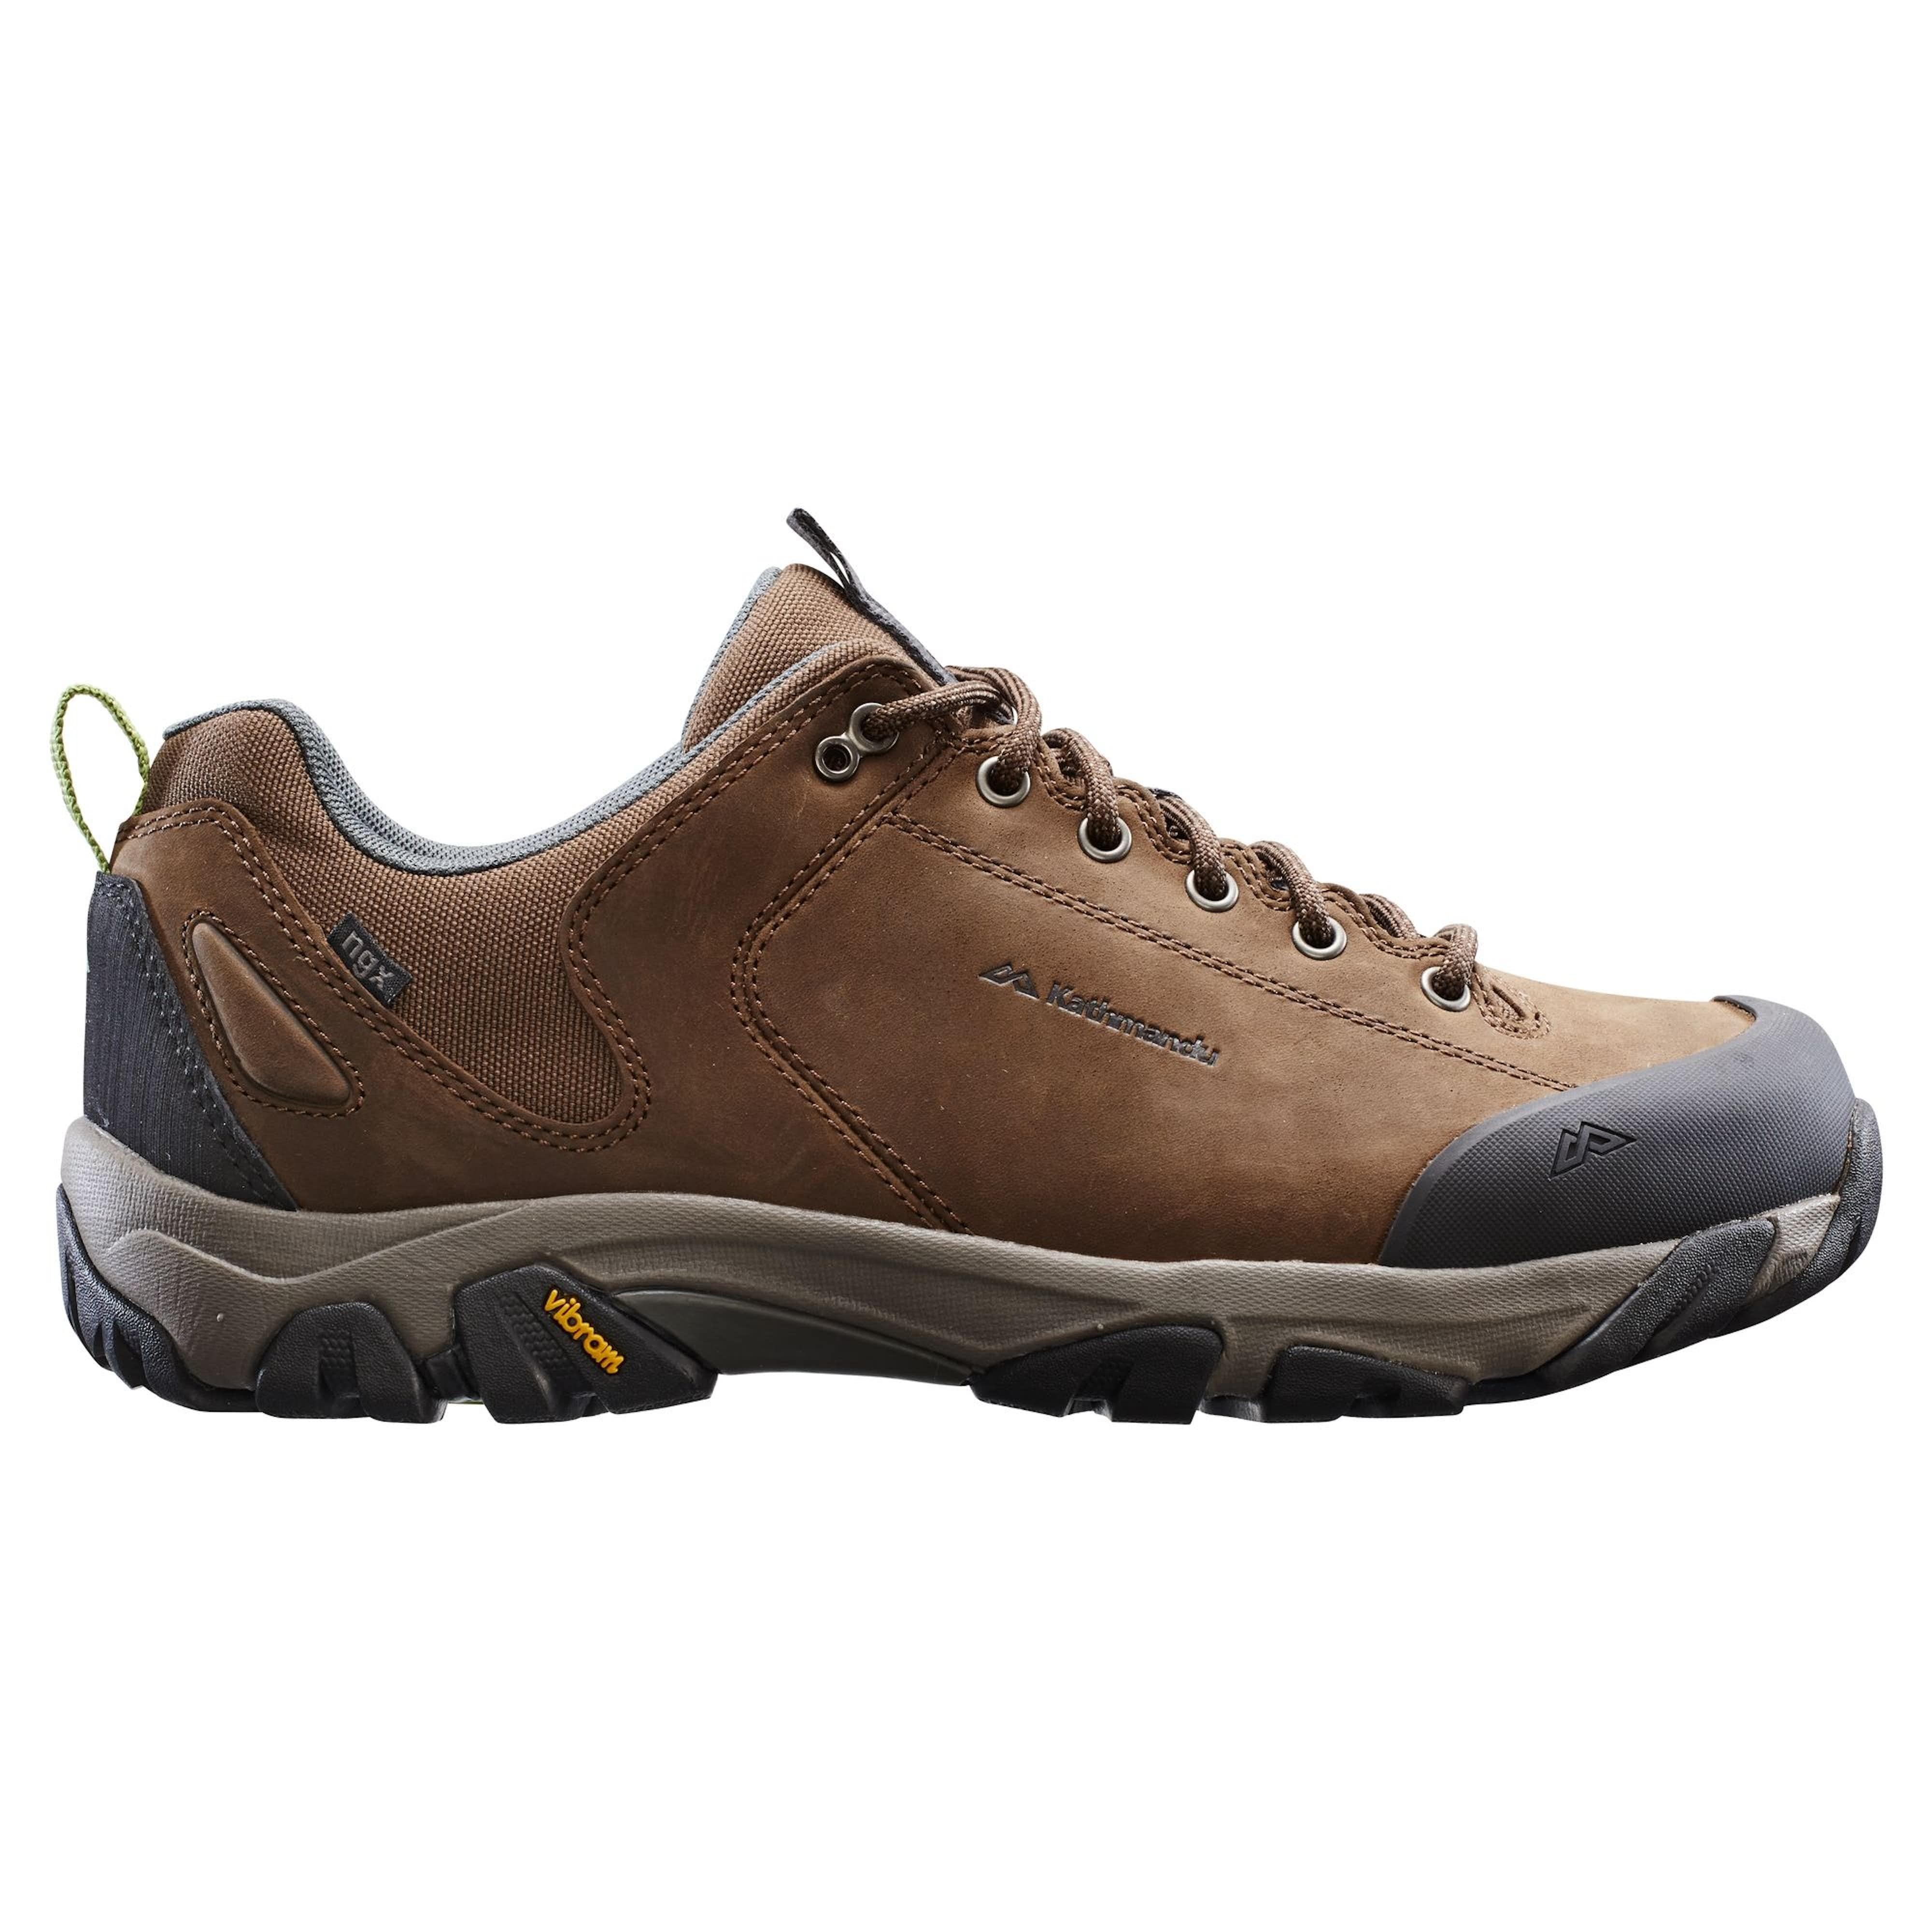 f0e8c98195c Kathmandu Footwear: Hiking Boots, Shoes, Sandals Sale | AU